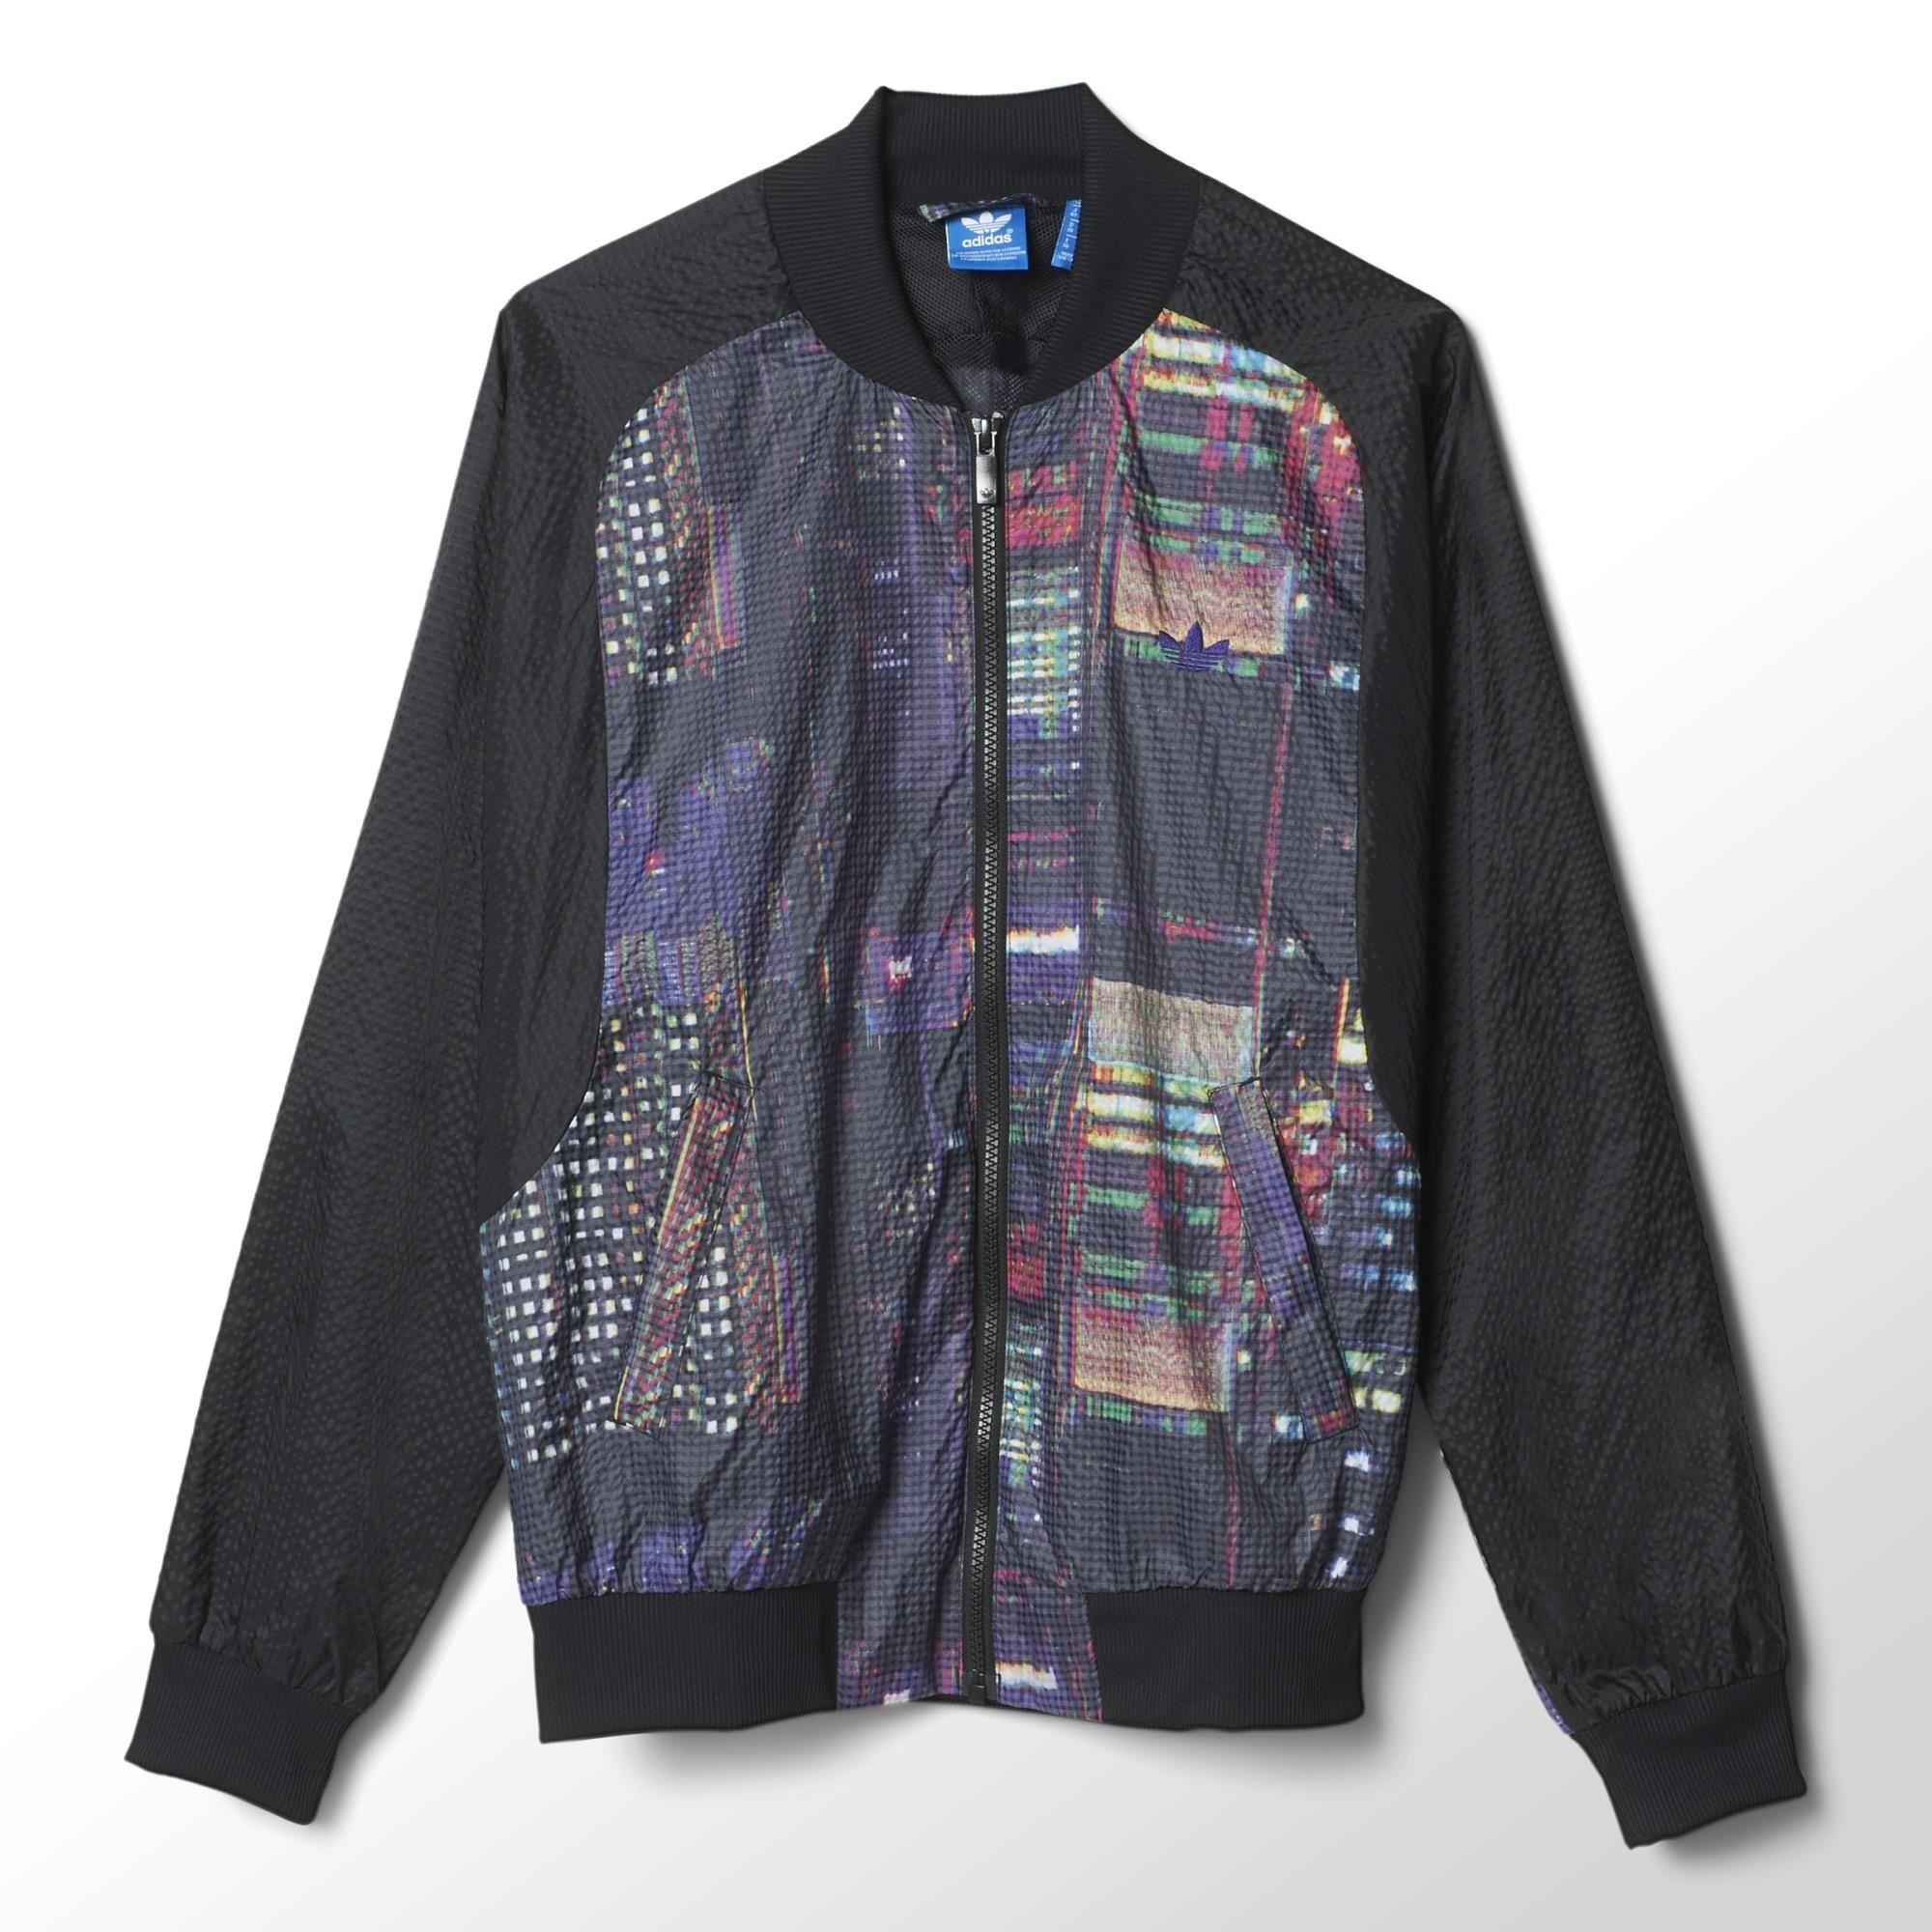 Adidas Tokio Mujer Chaqueta Superstarnegromulticolo Originals SUpqVzM